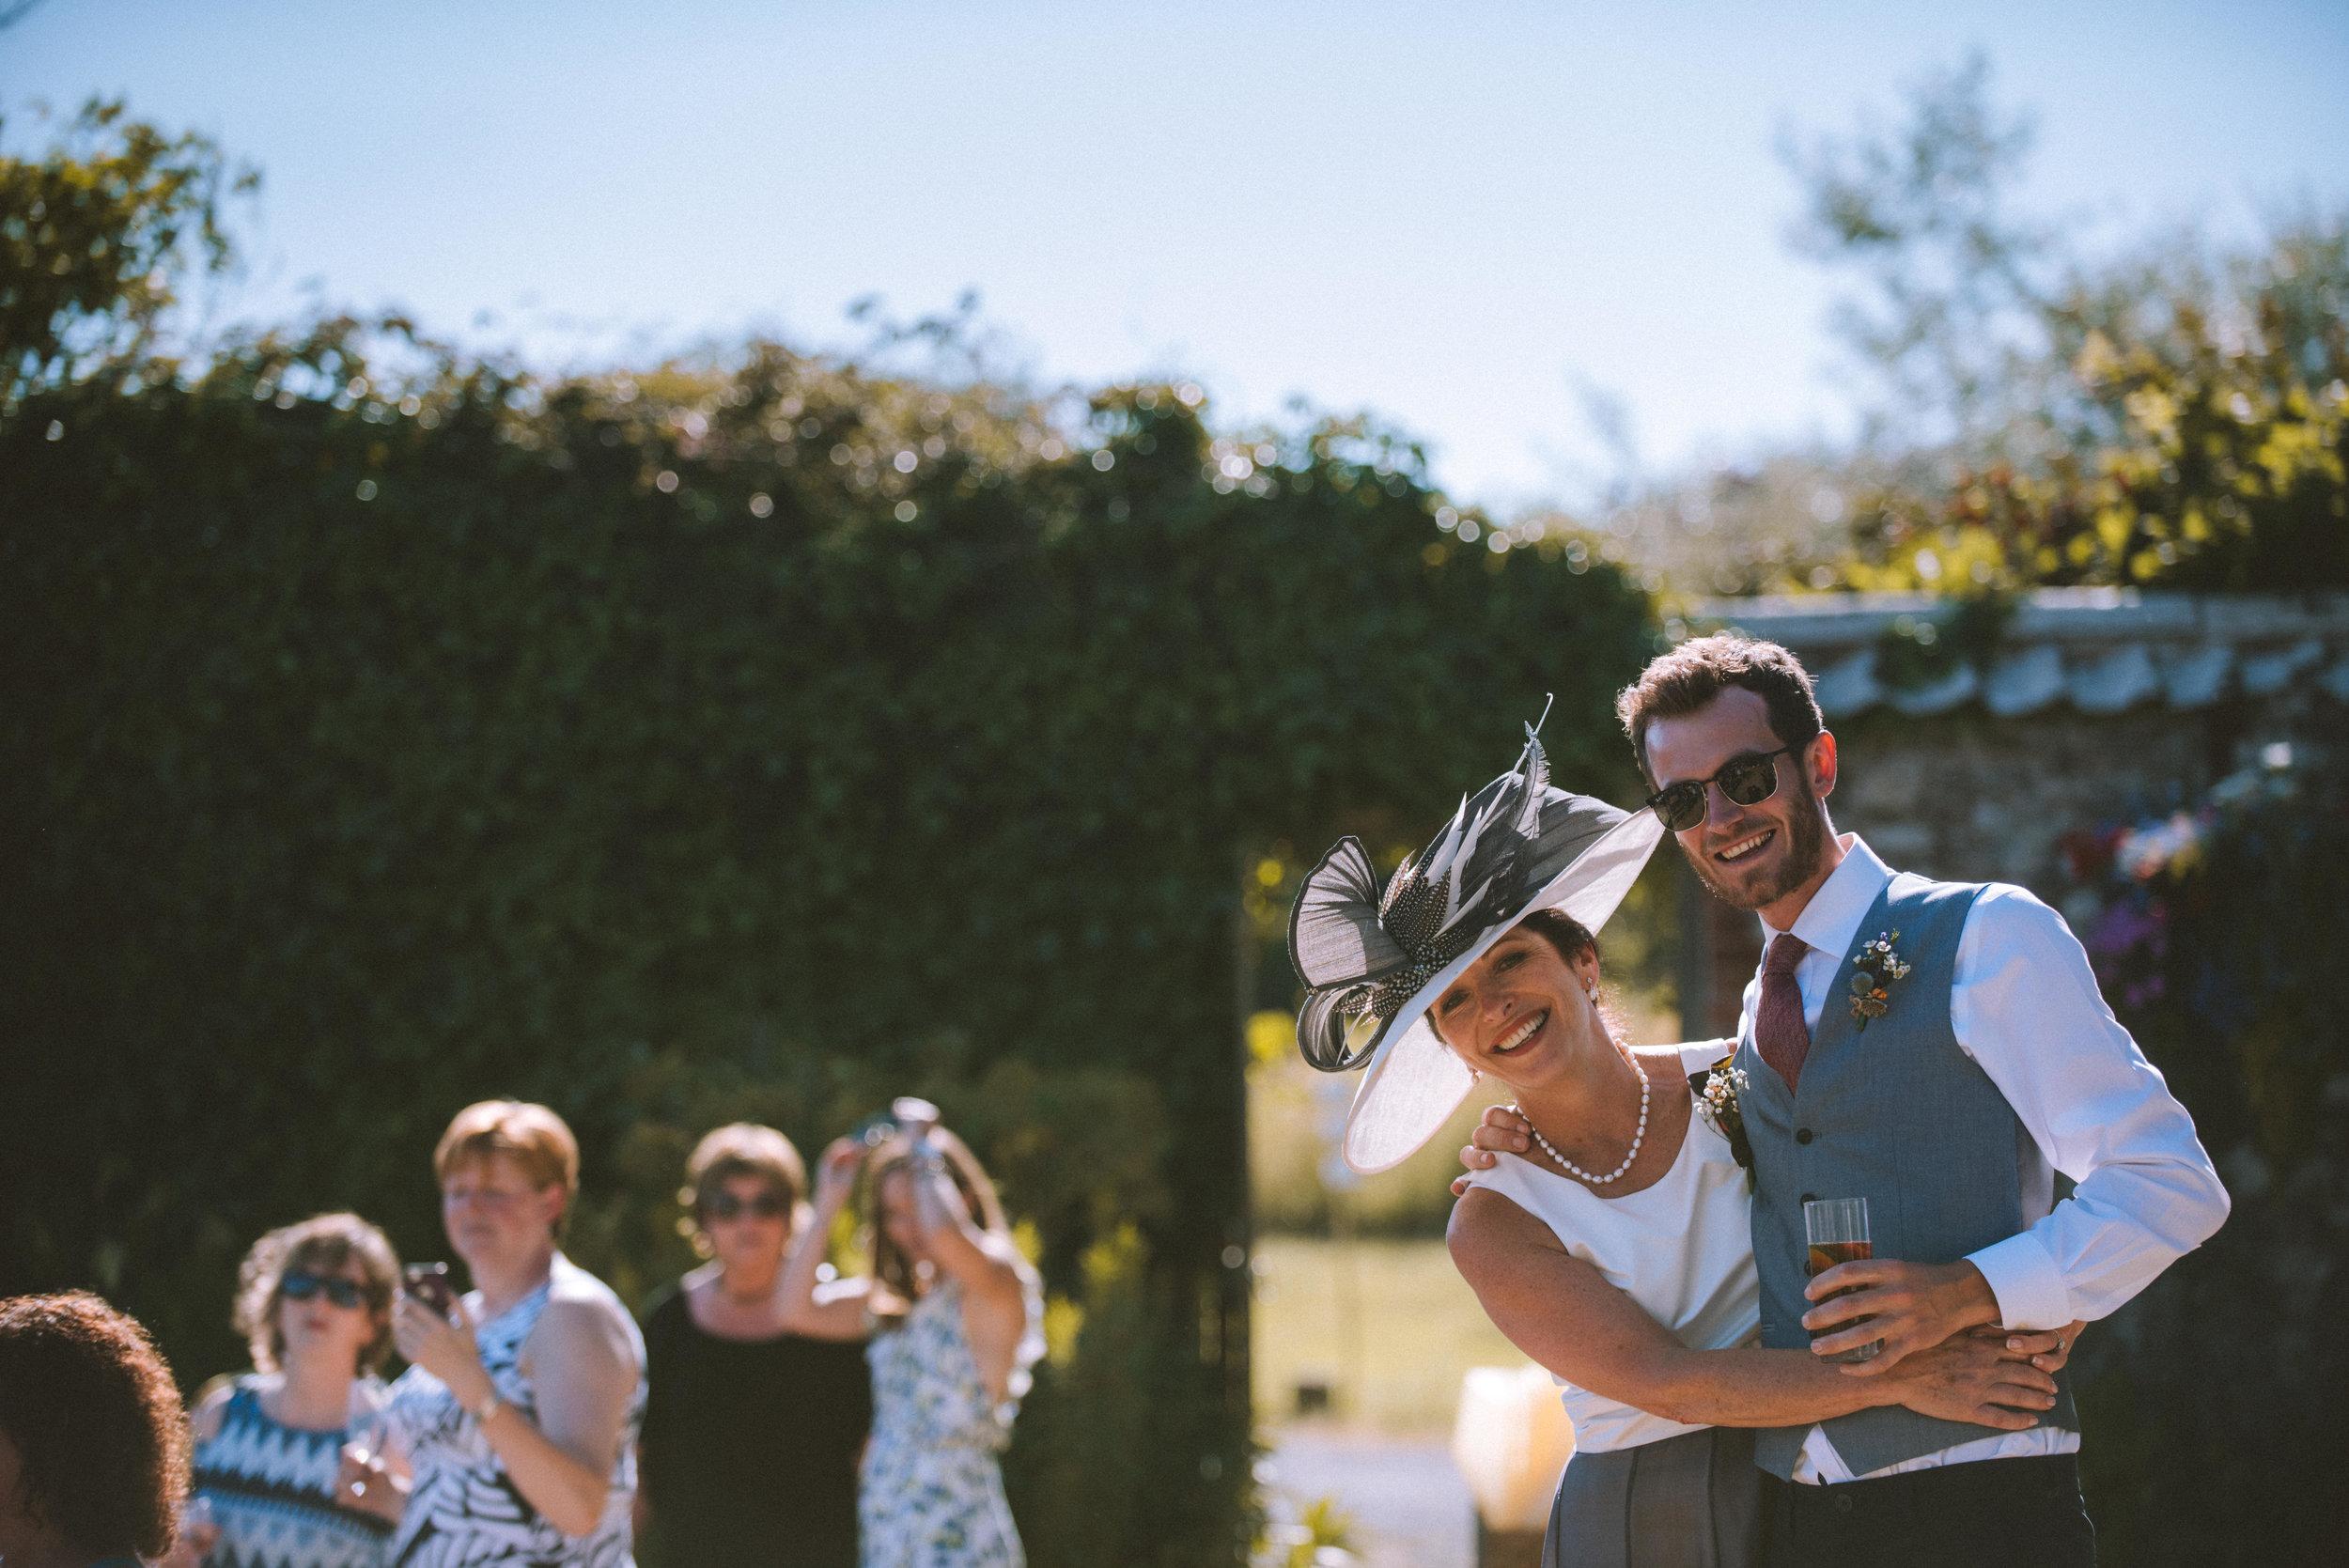 ashbarton-estate-wedding-photographer-mark-shaw-43.jpg